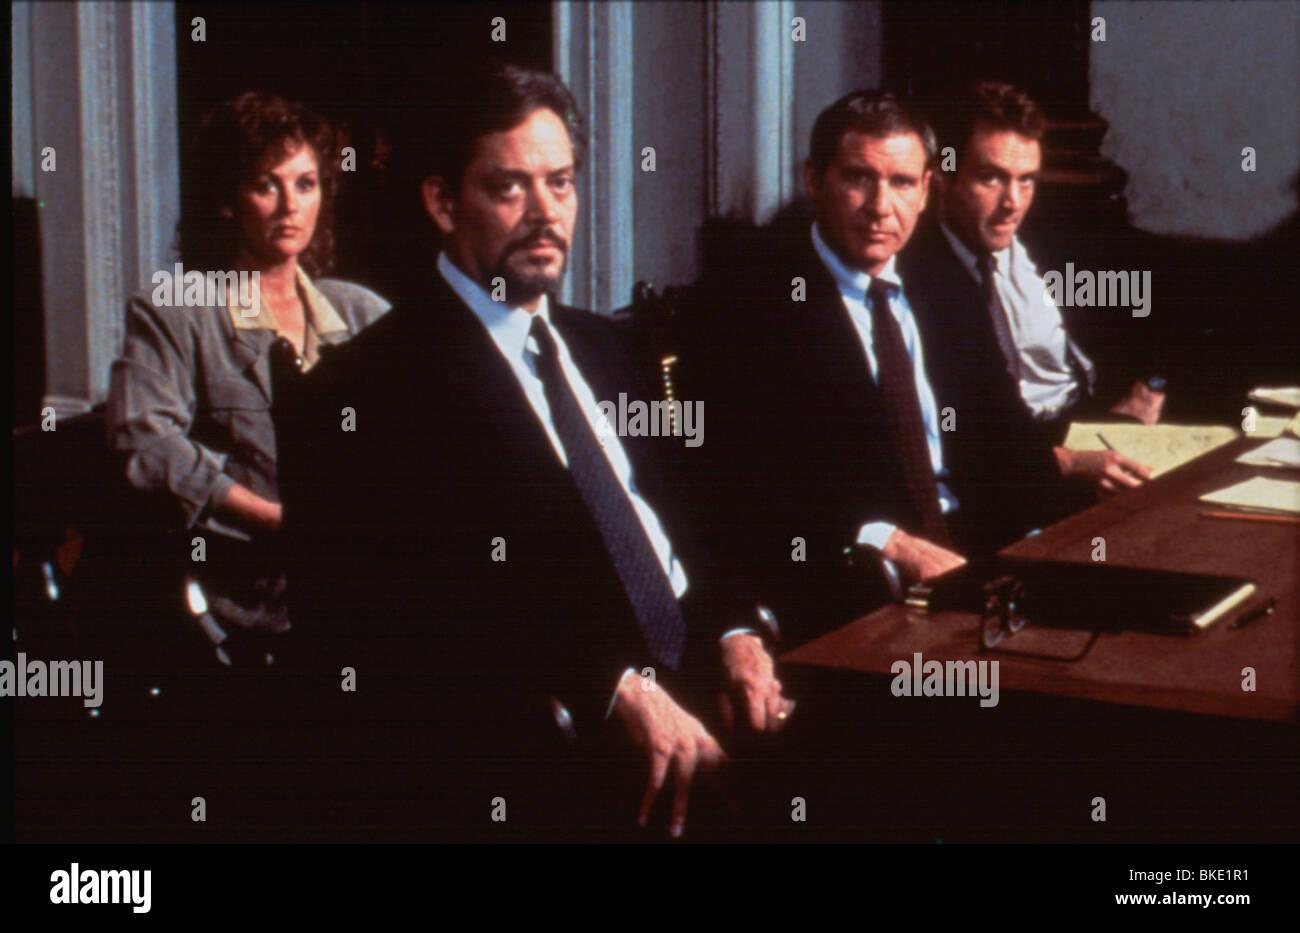 PRESUMED INNOCENT (1990) BONNIE BEDELIA, RAUL JULIA, HARRISON FORD PRI 017  Harrison Ford Presumed Innocent